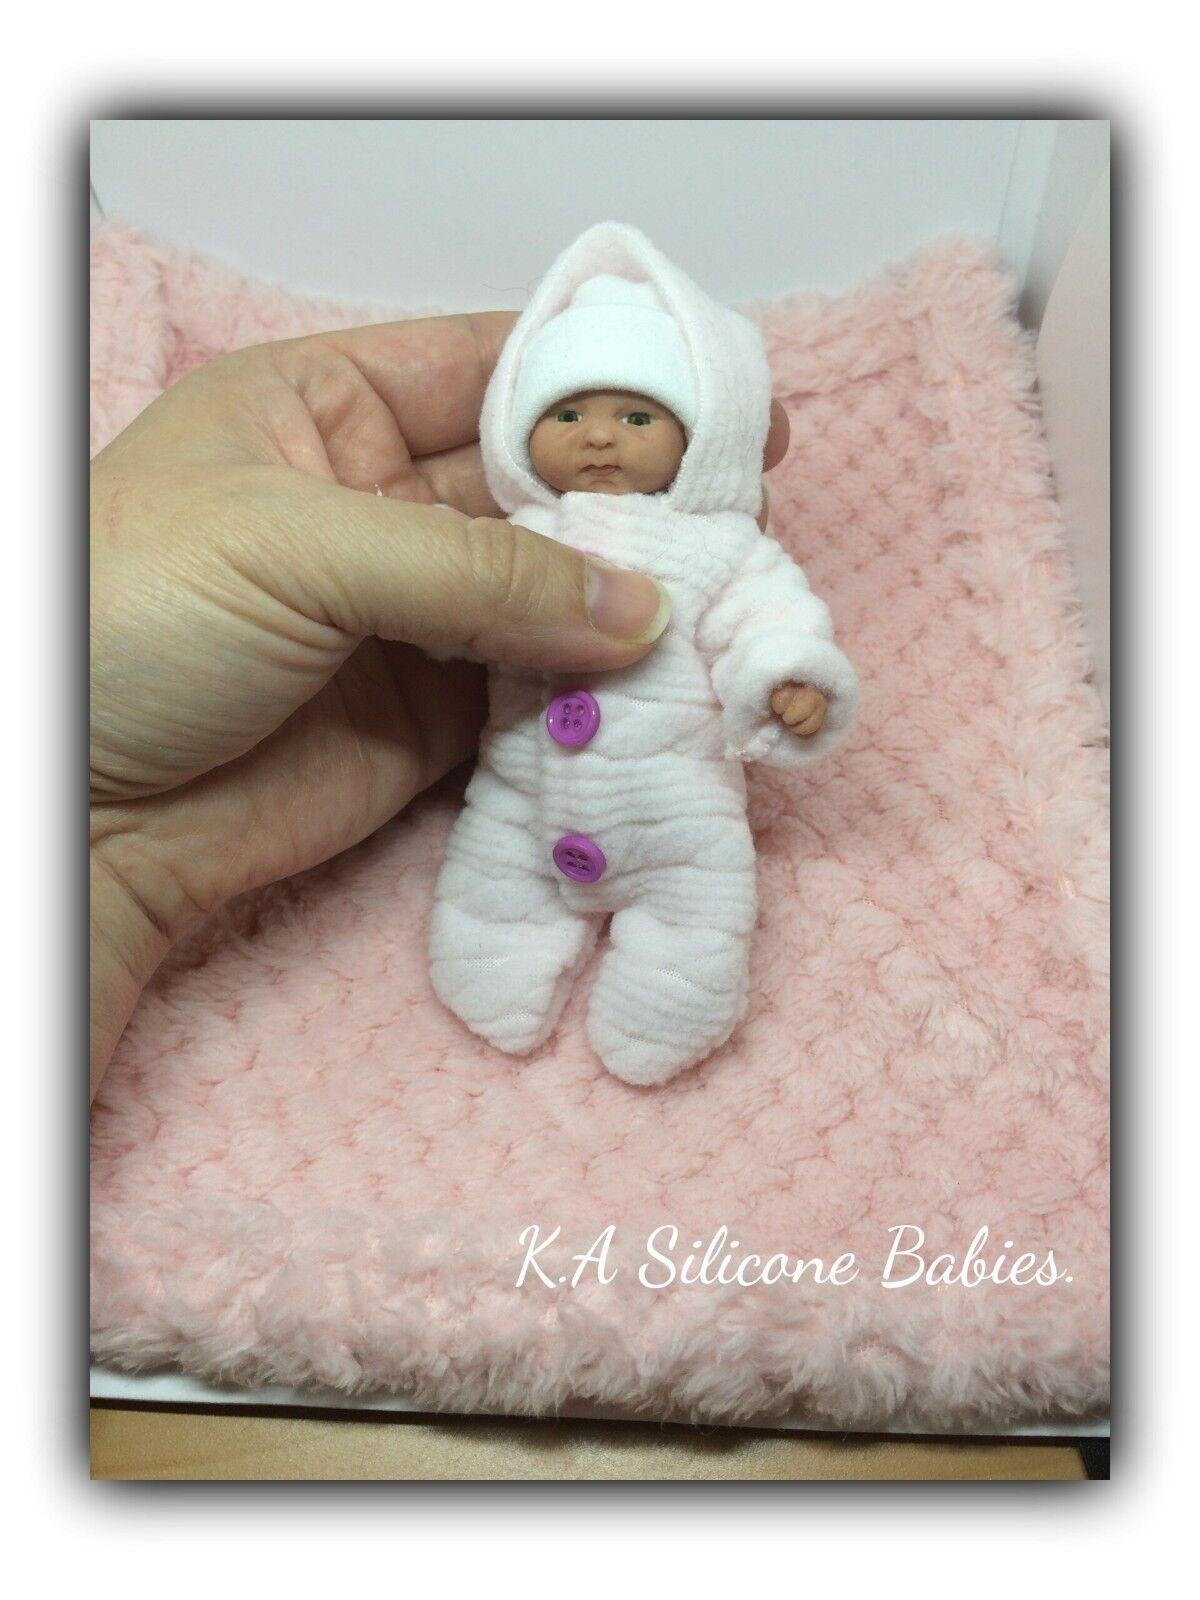 Cuerpo Completo Mini de Silicona Baby Girl Jazmín.